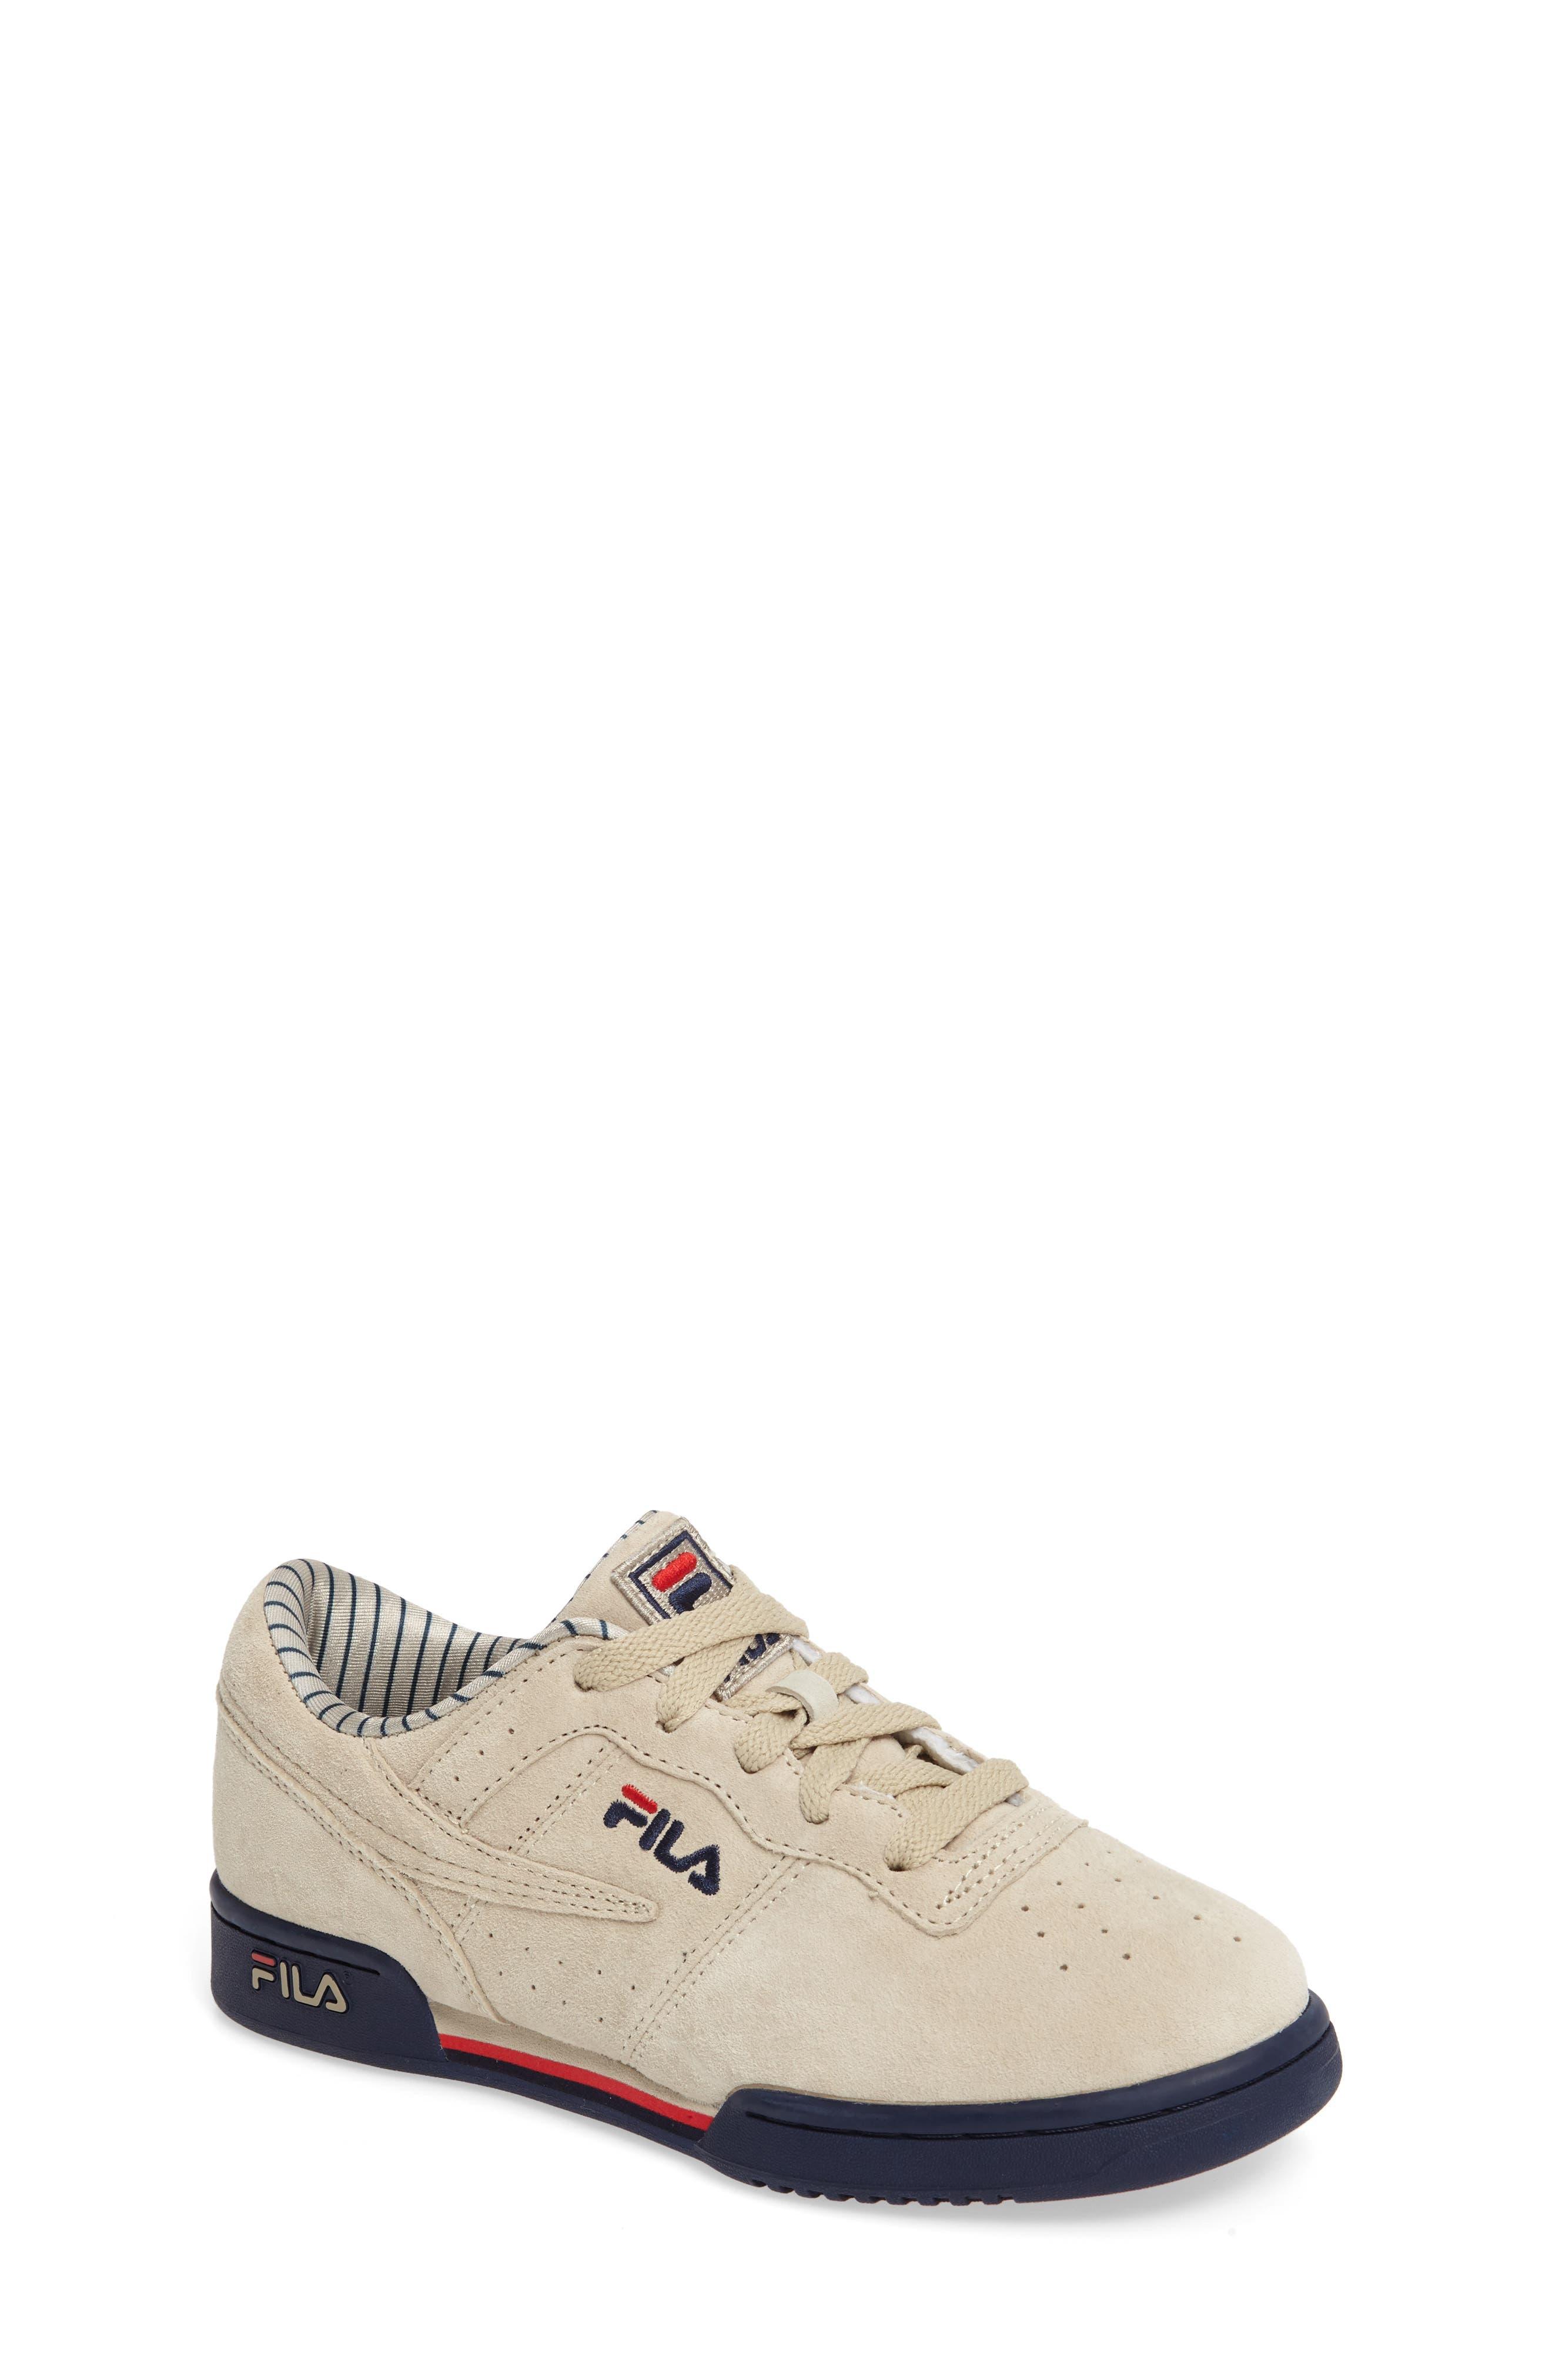 FILA Original Fitness Sneaker, Main, color, 900